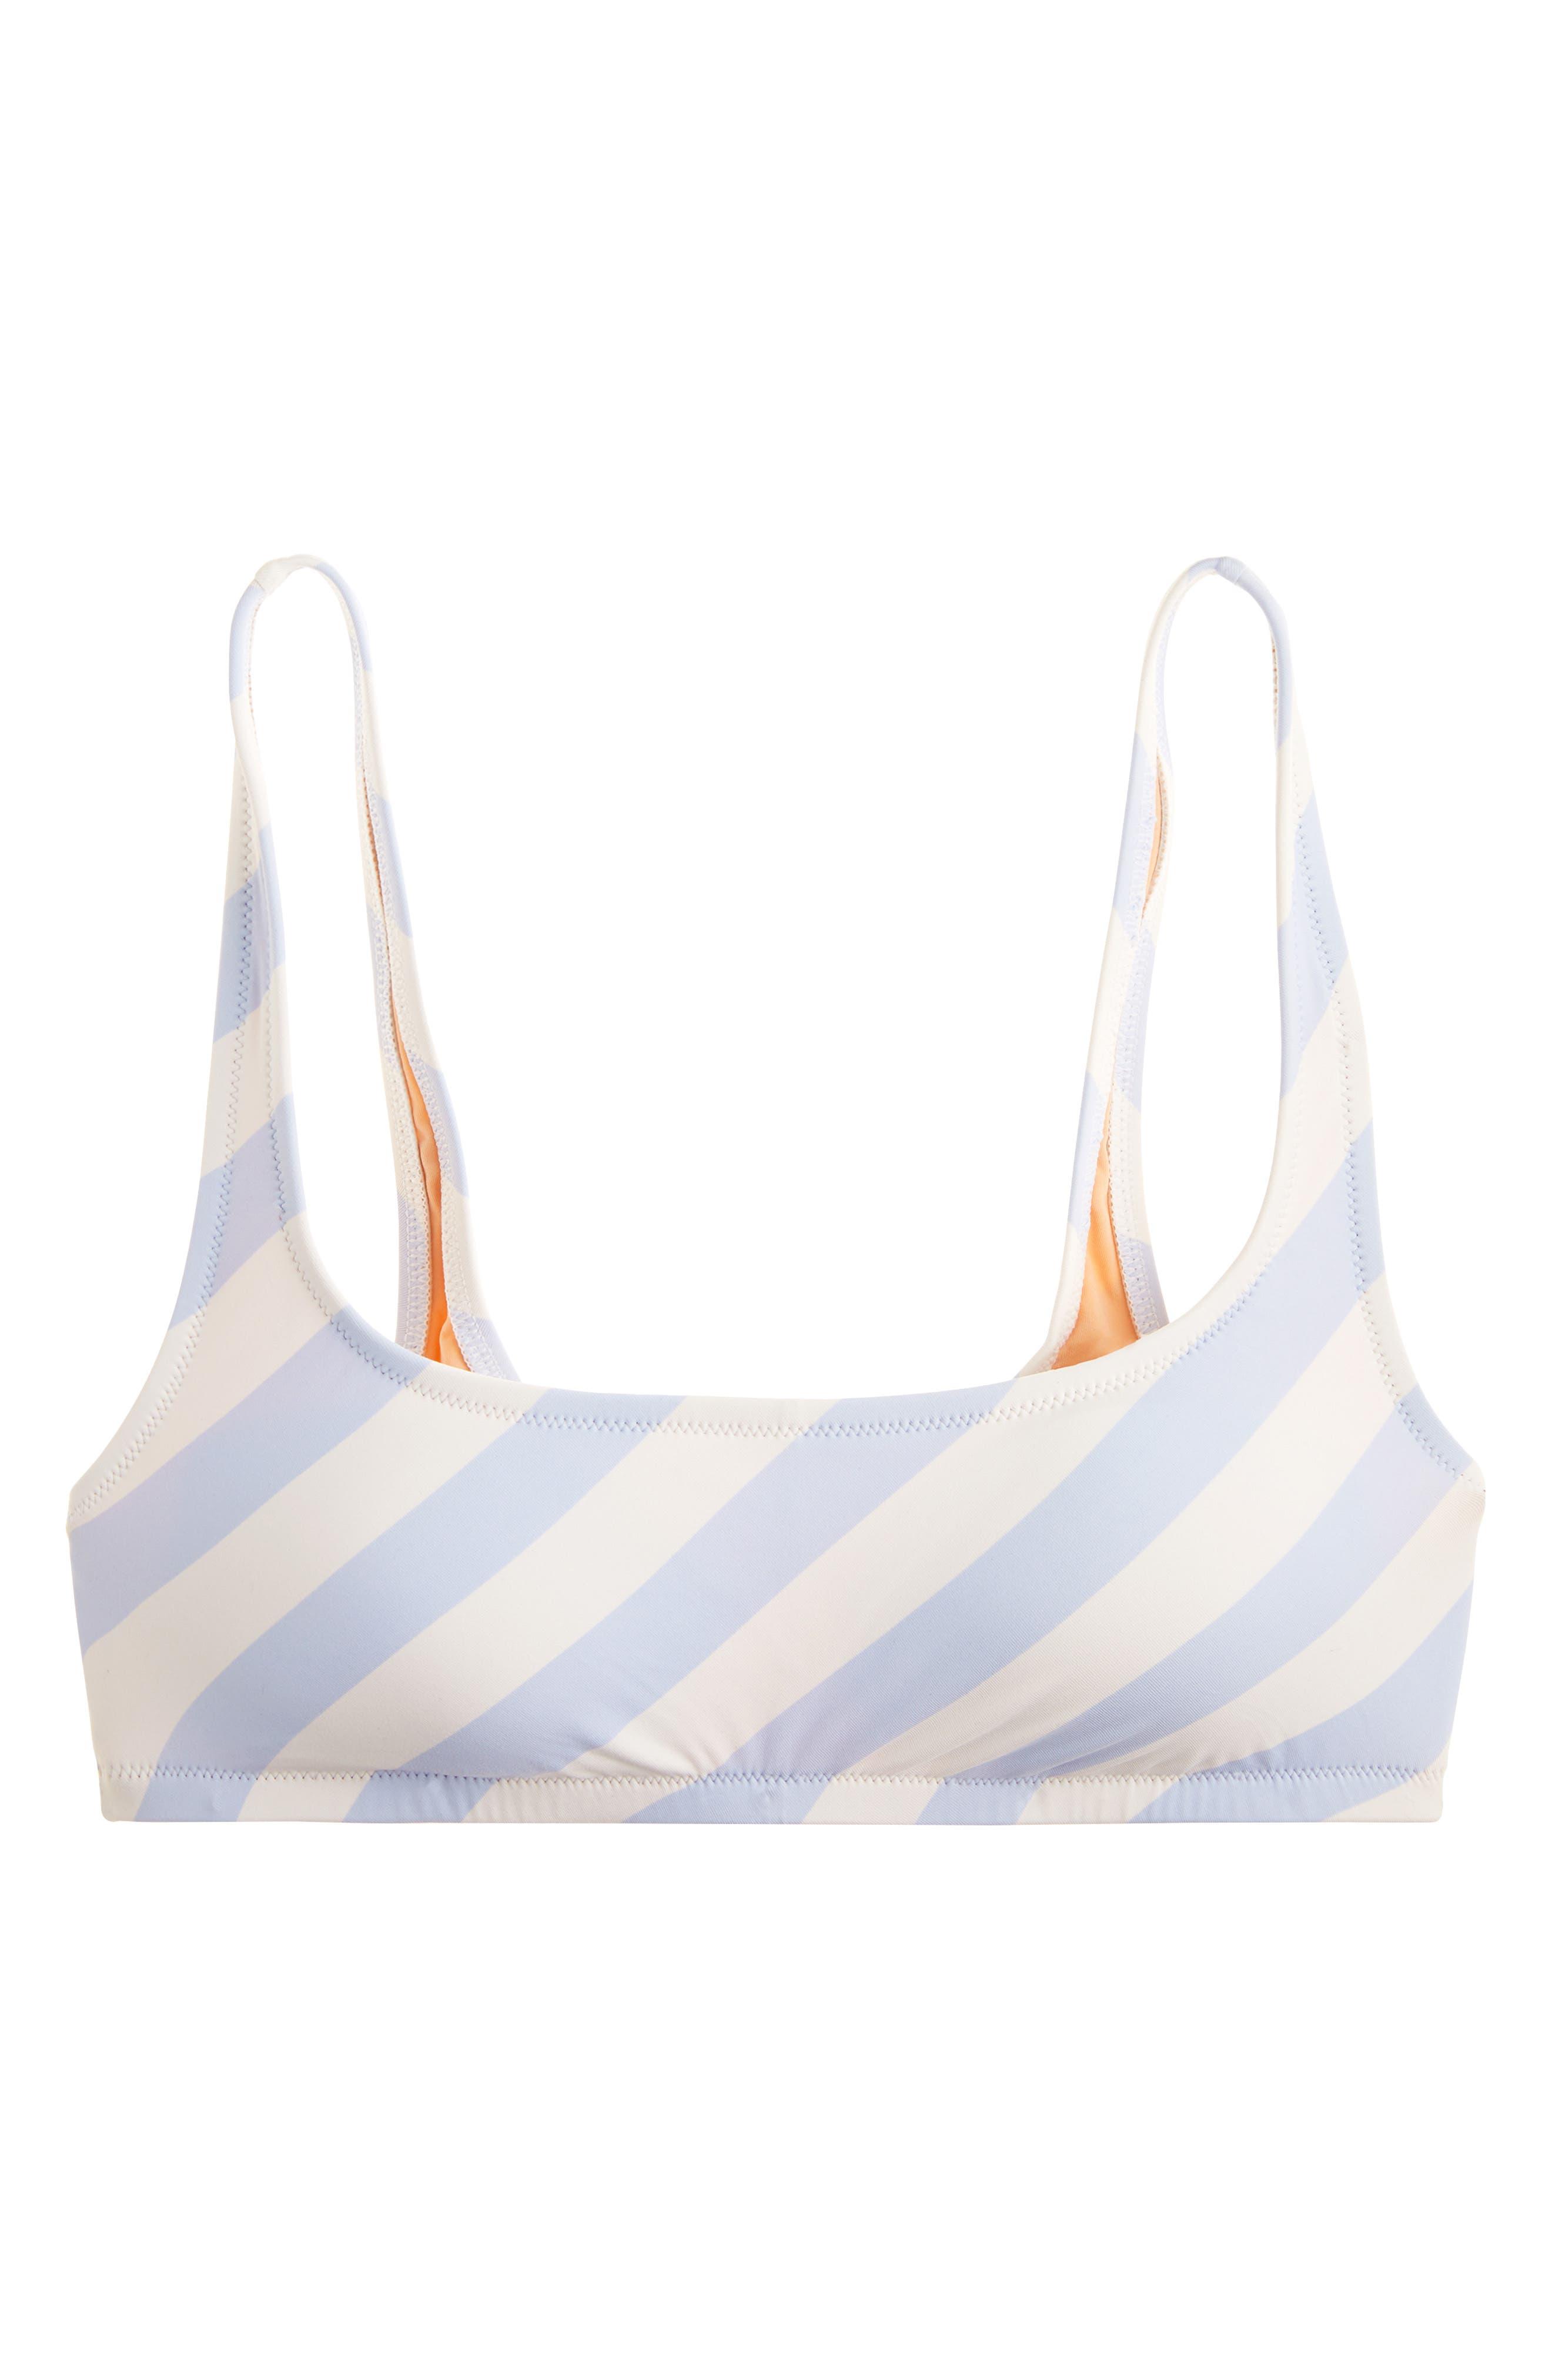 J.CREW, Stripe Scoop Neck Bikini Top, Alternate thumbnail 4, color, 400